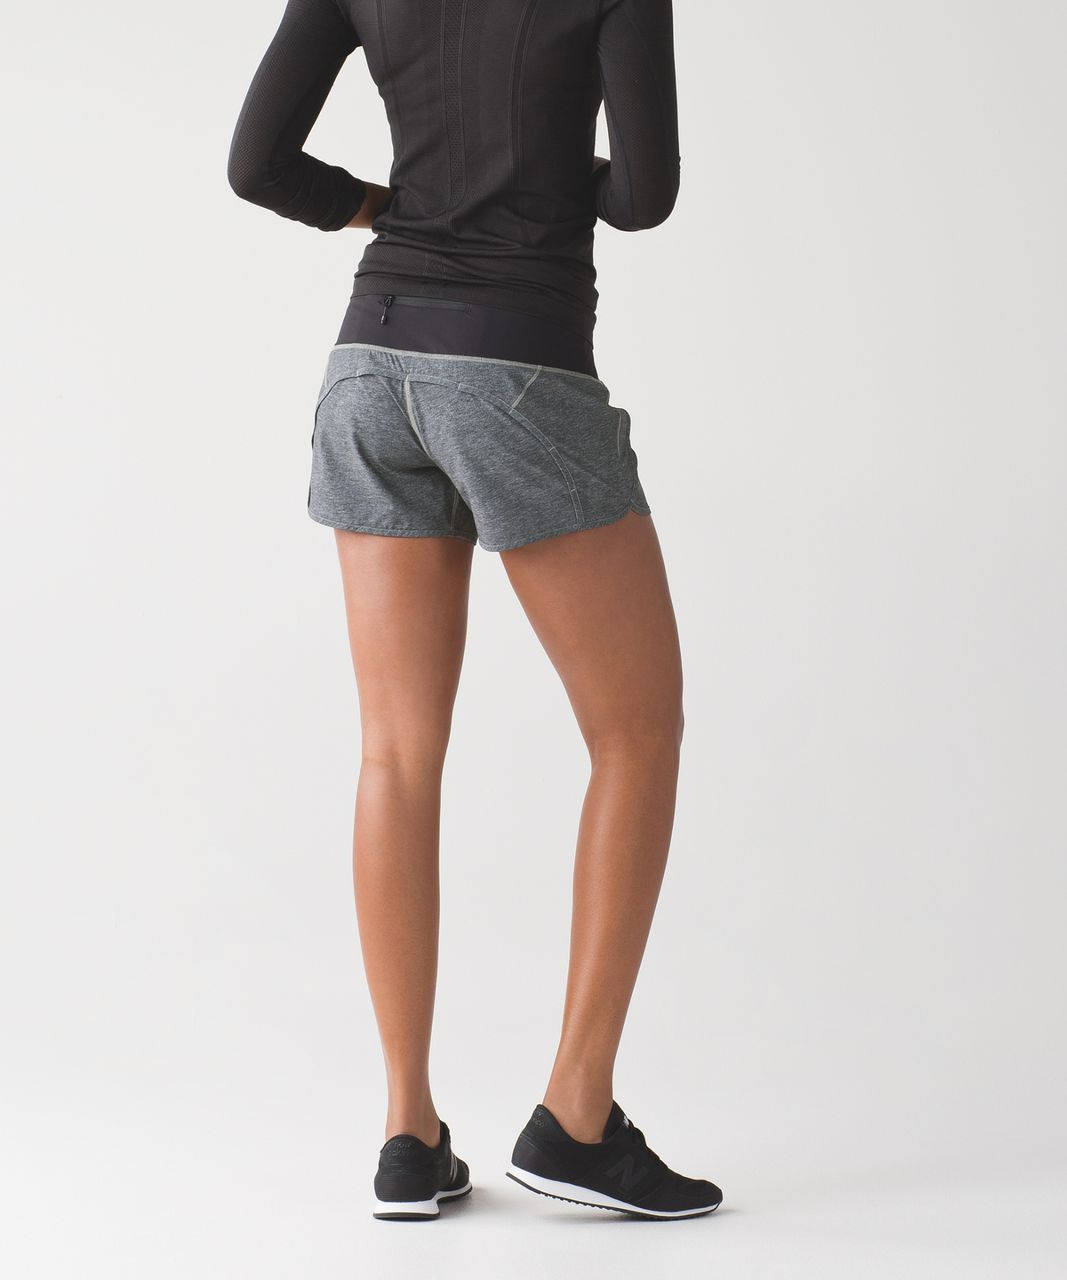 Lululemon Run Times Short - Heathered Texture Printed Greyt Deep Coal / Black